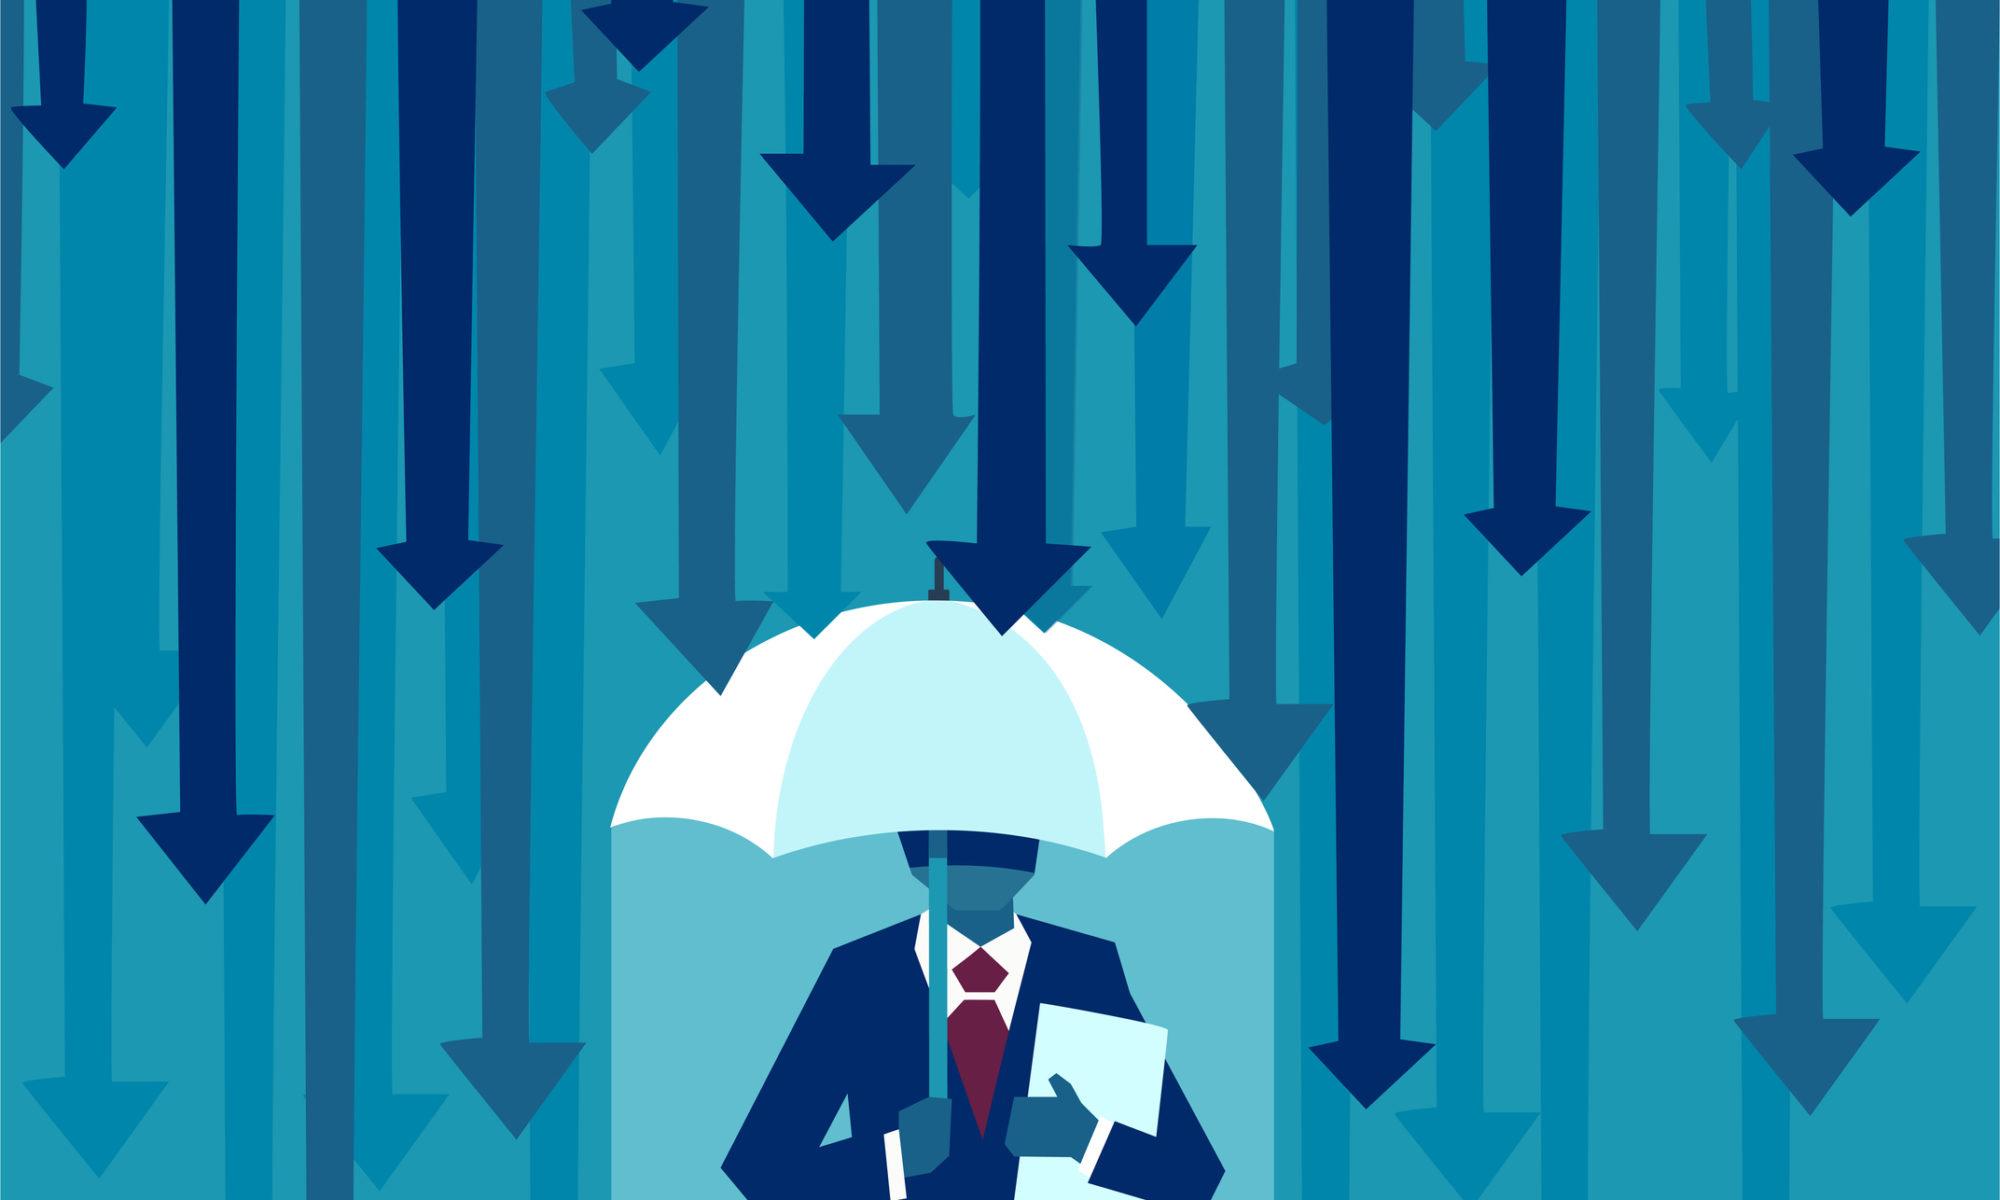 man standing under umbrella while it rains arrows